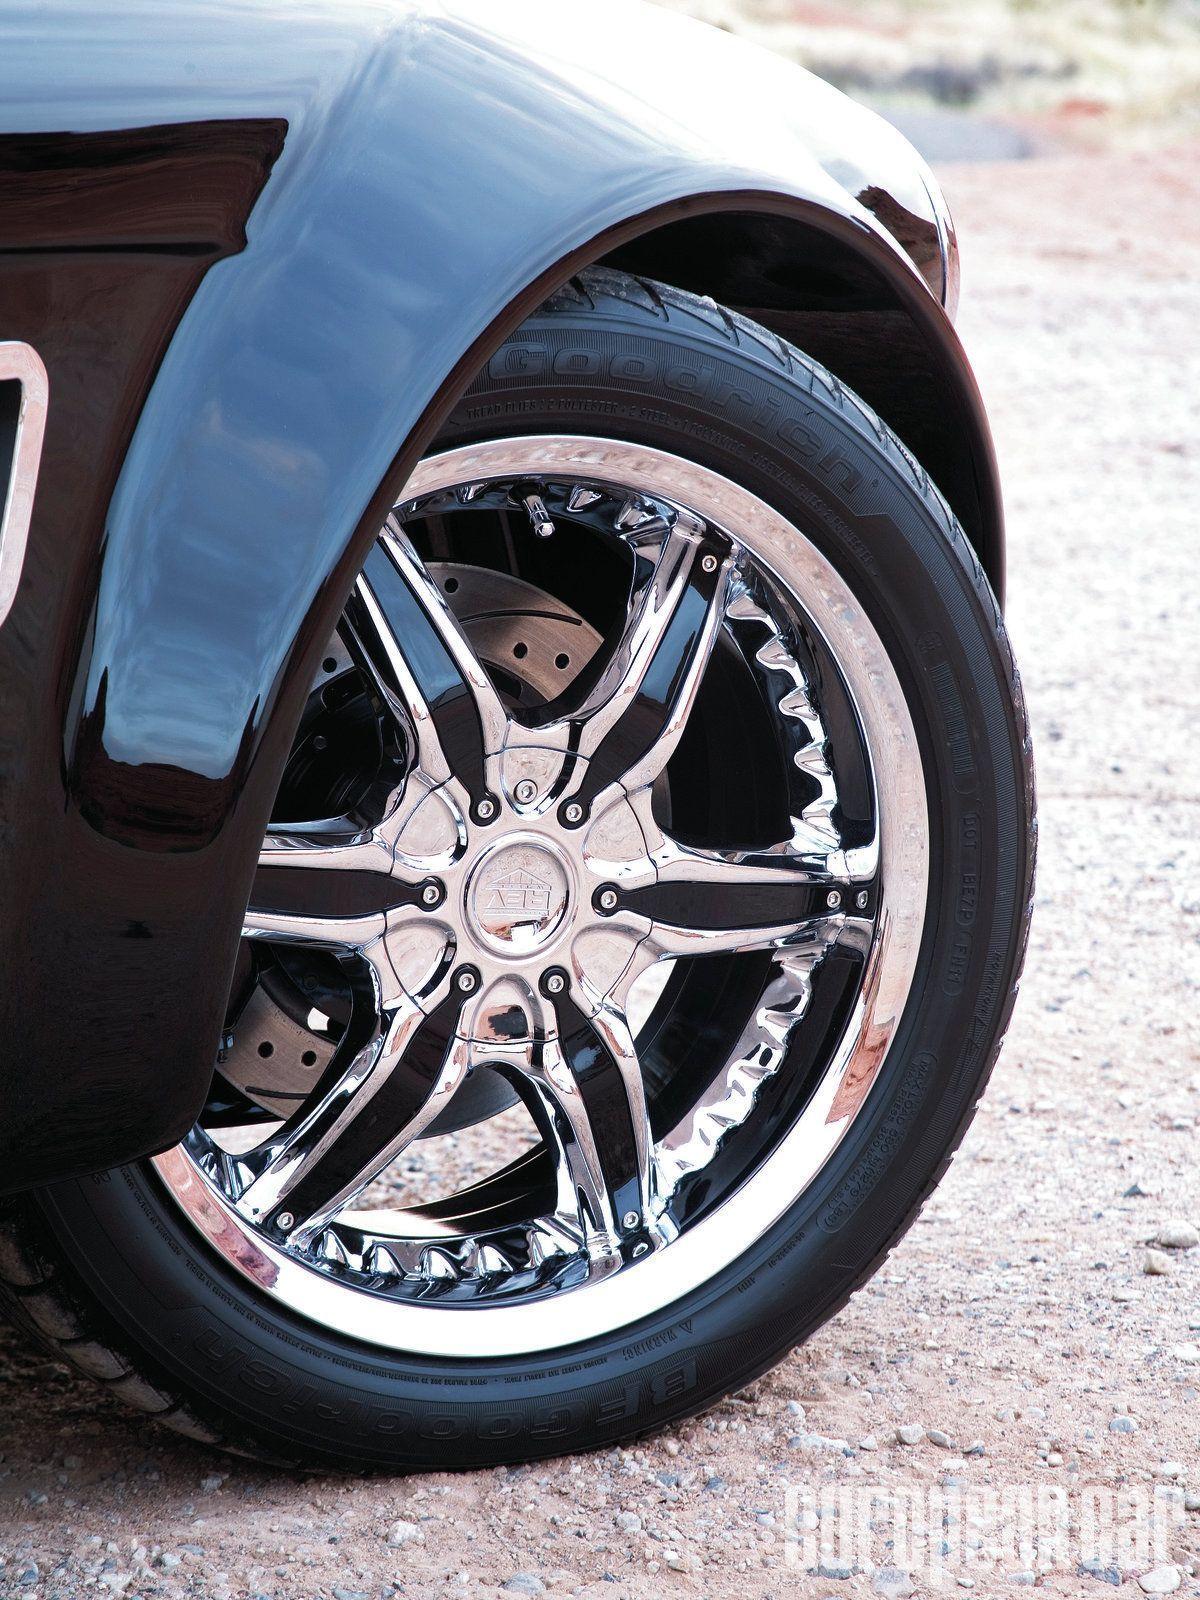 Epcp 1204 08 o+1962 austin healey+alloy wheels | Austin Healy ...